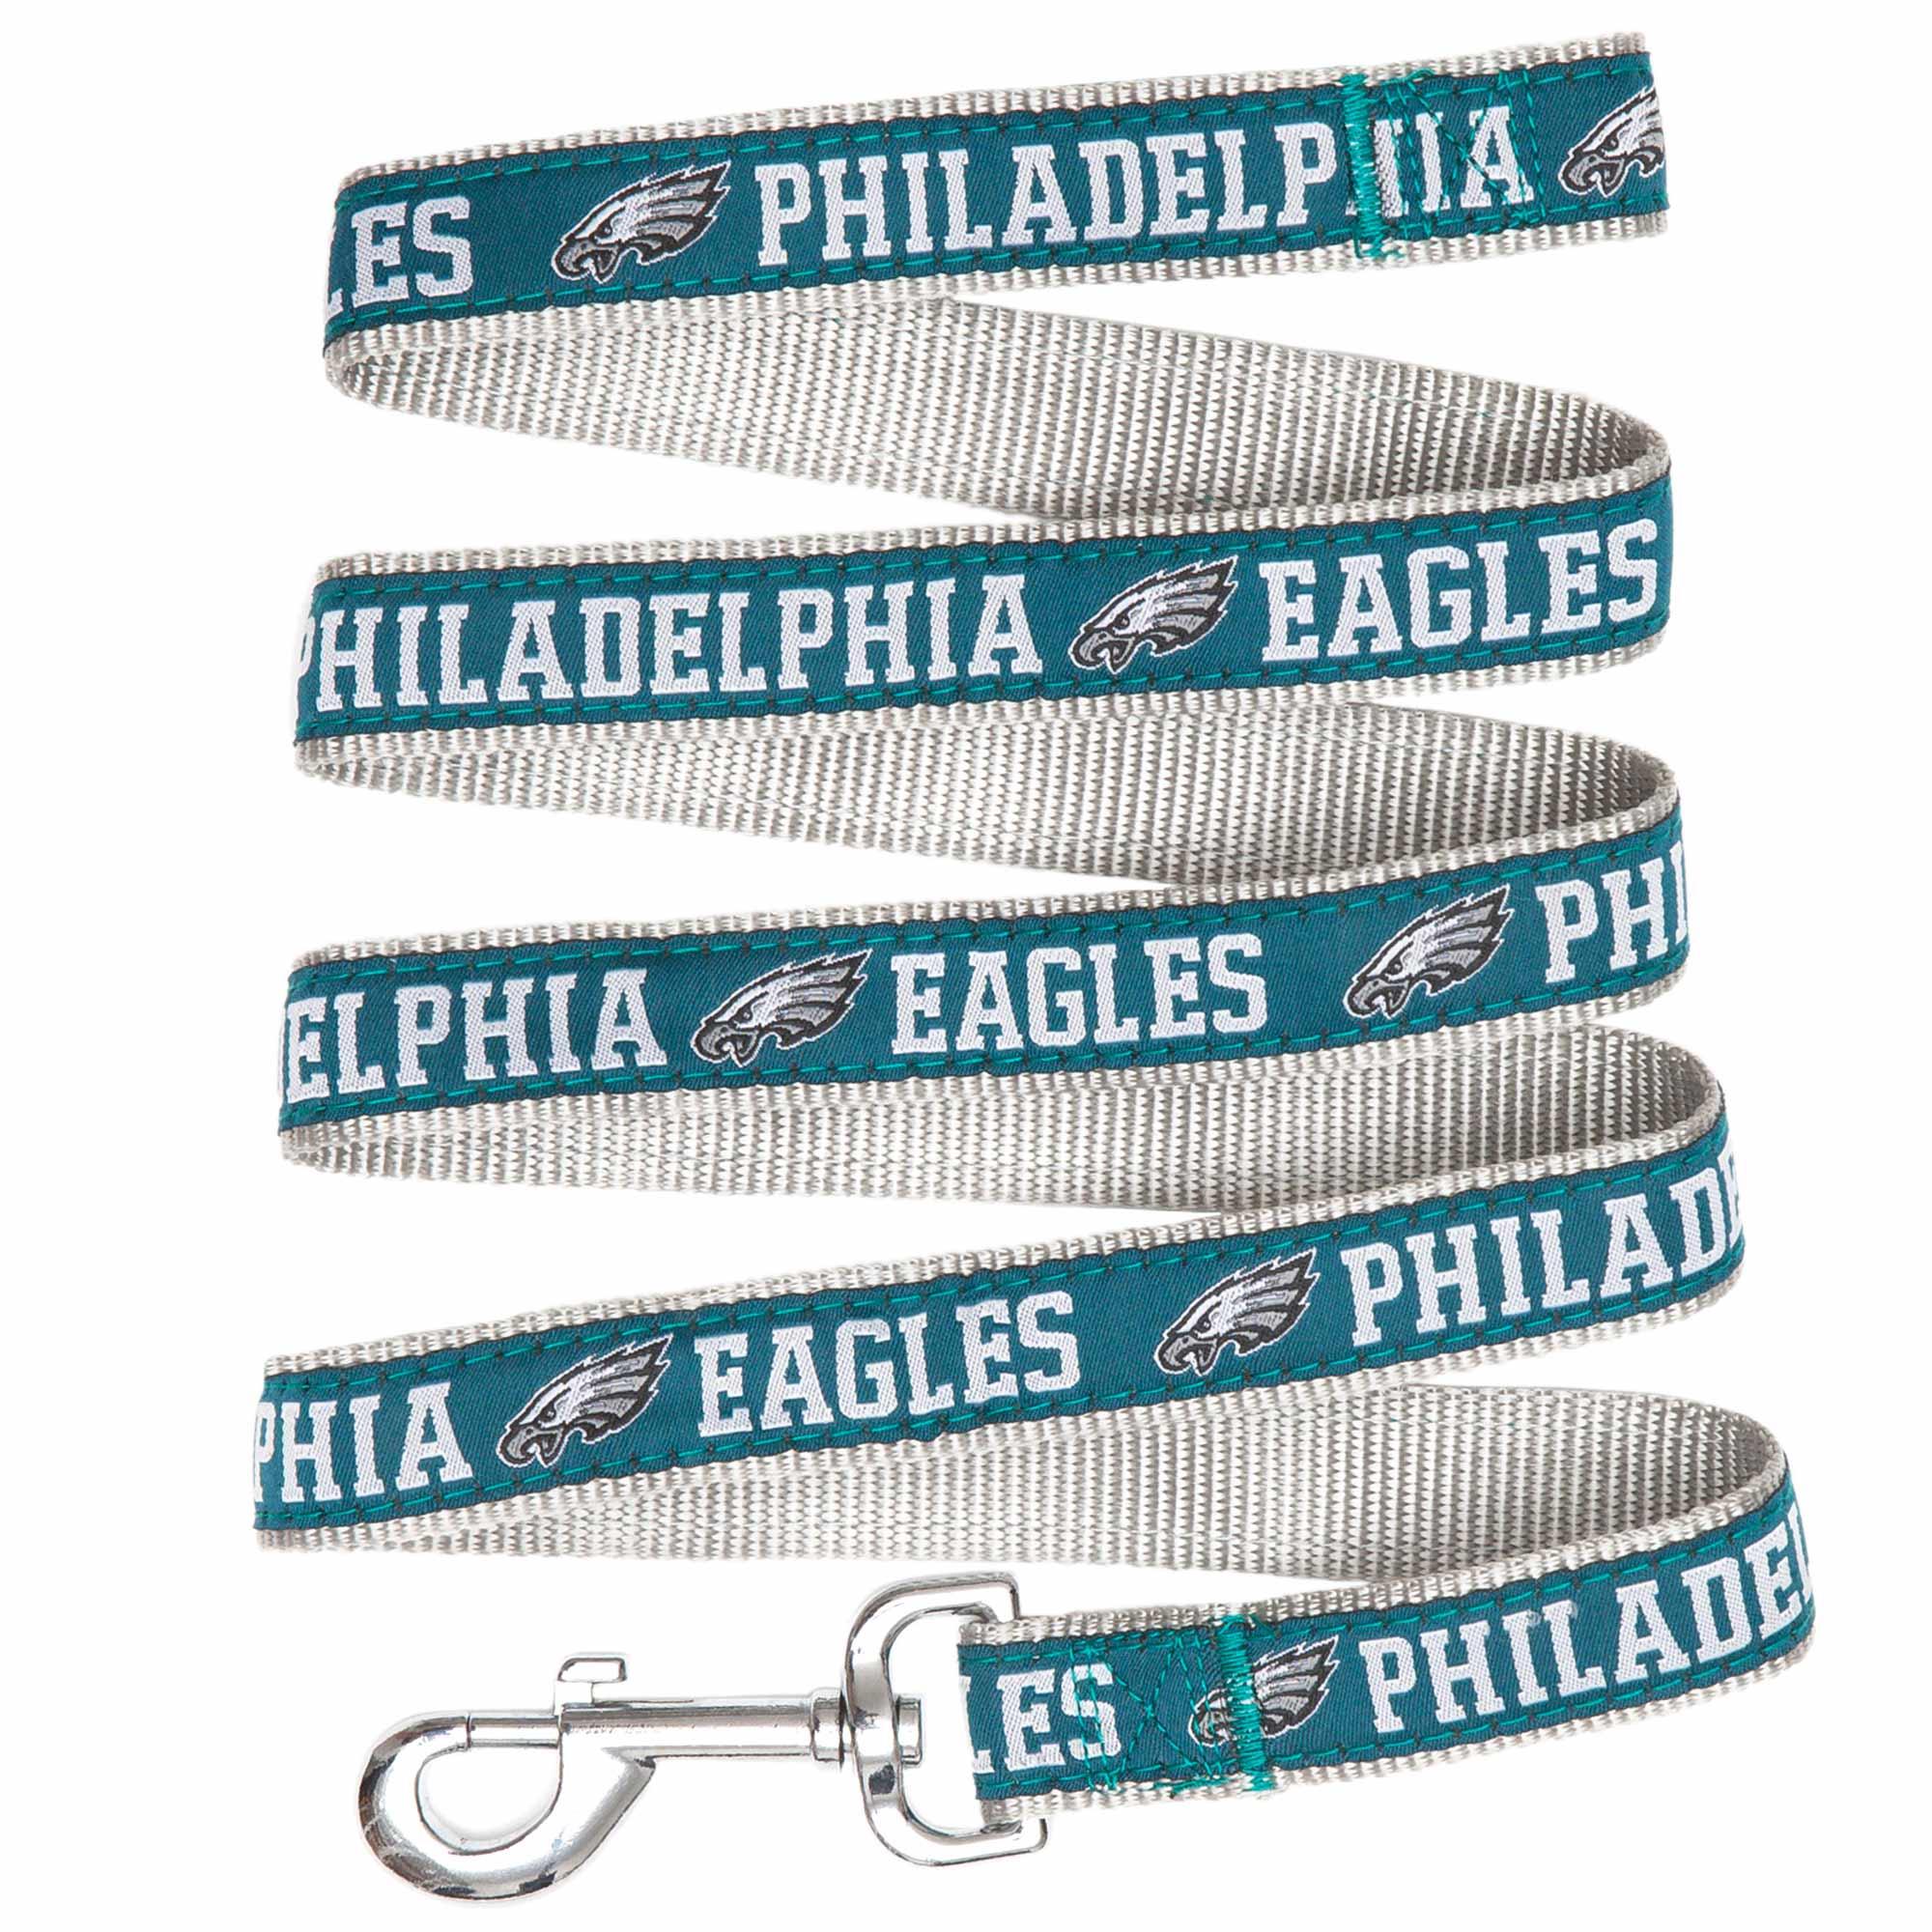 Philadelphia Eagles Leash